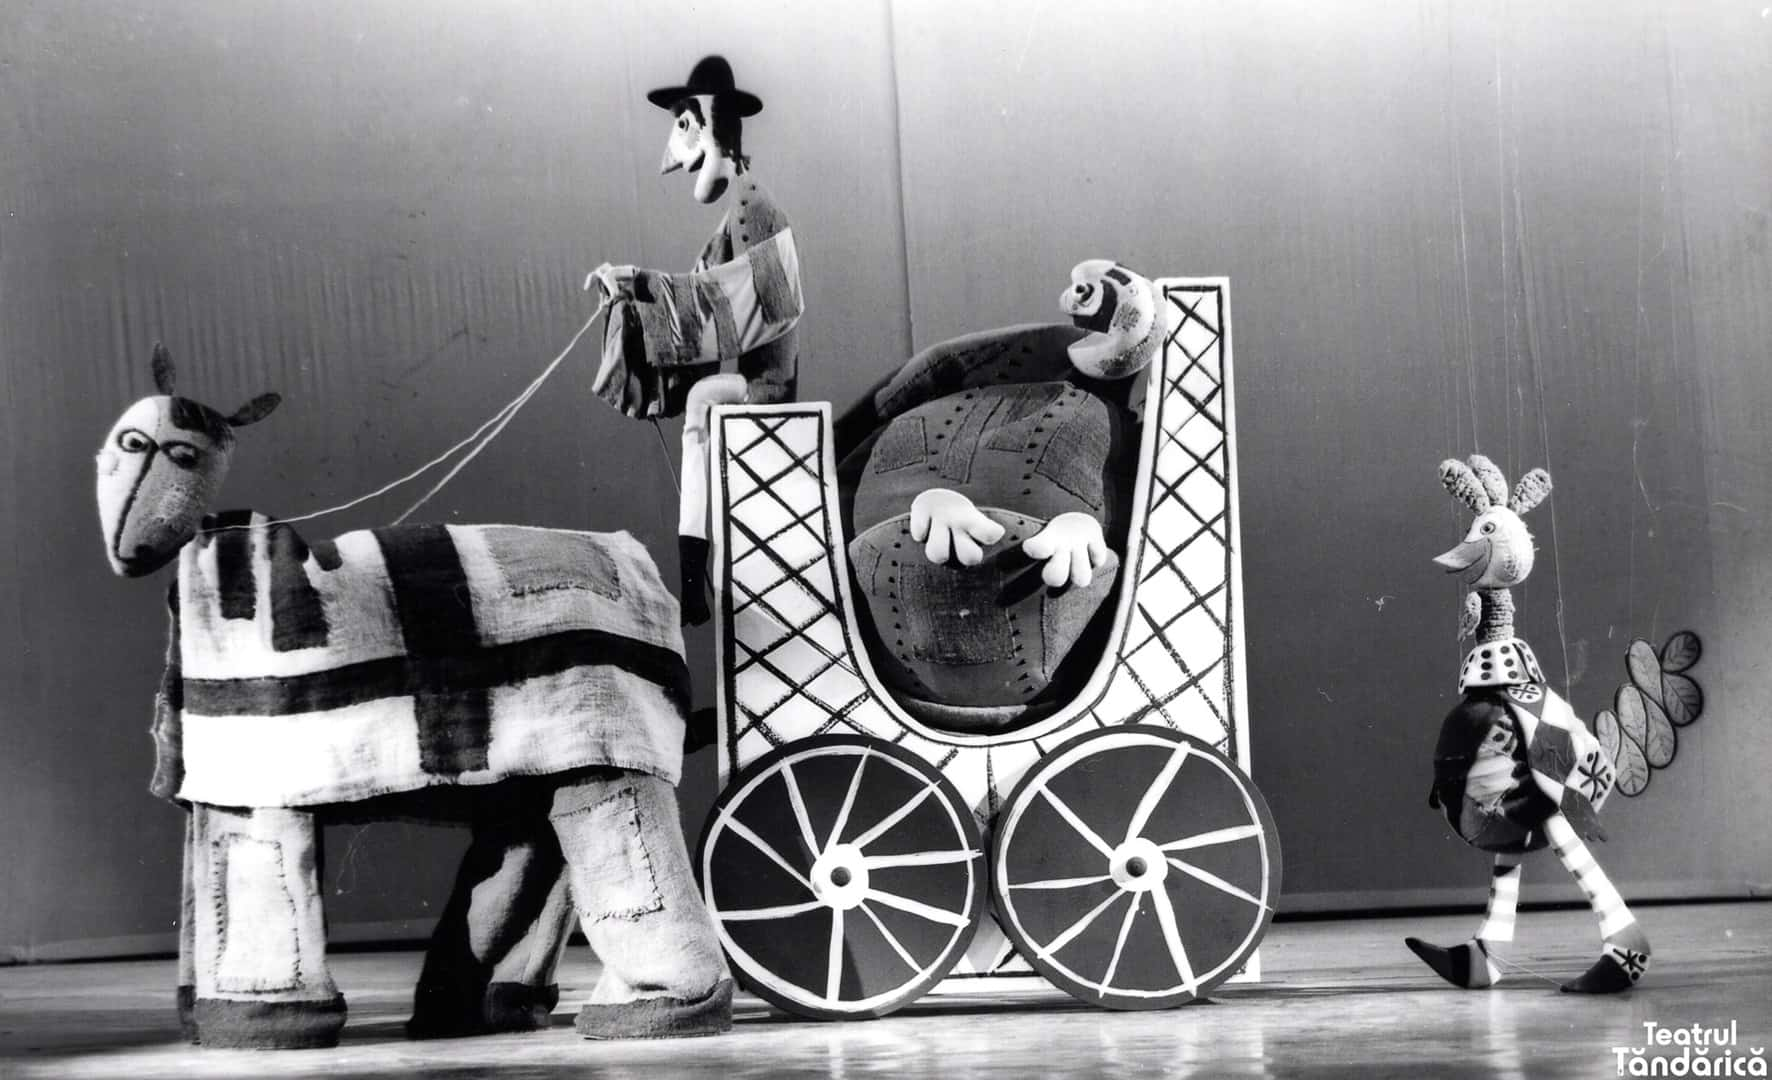 Teatrul-Tandarica-75-ani-episodul-3-27